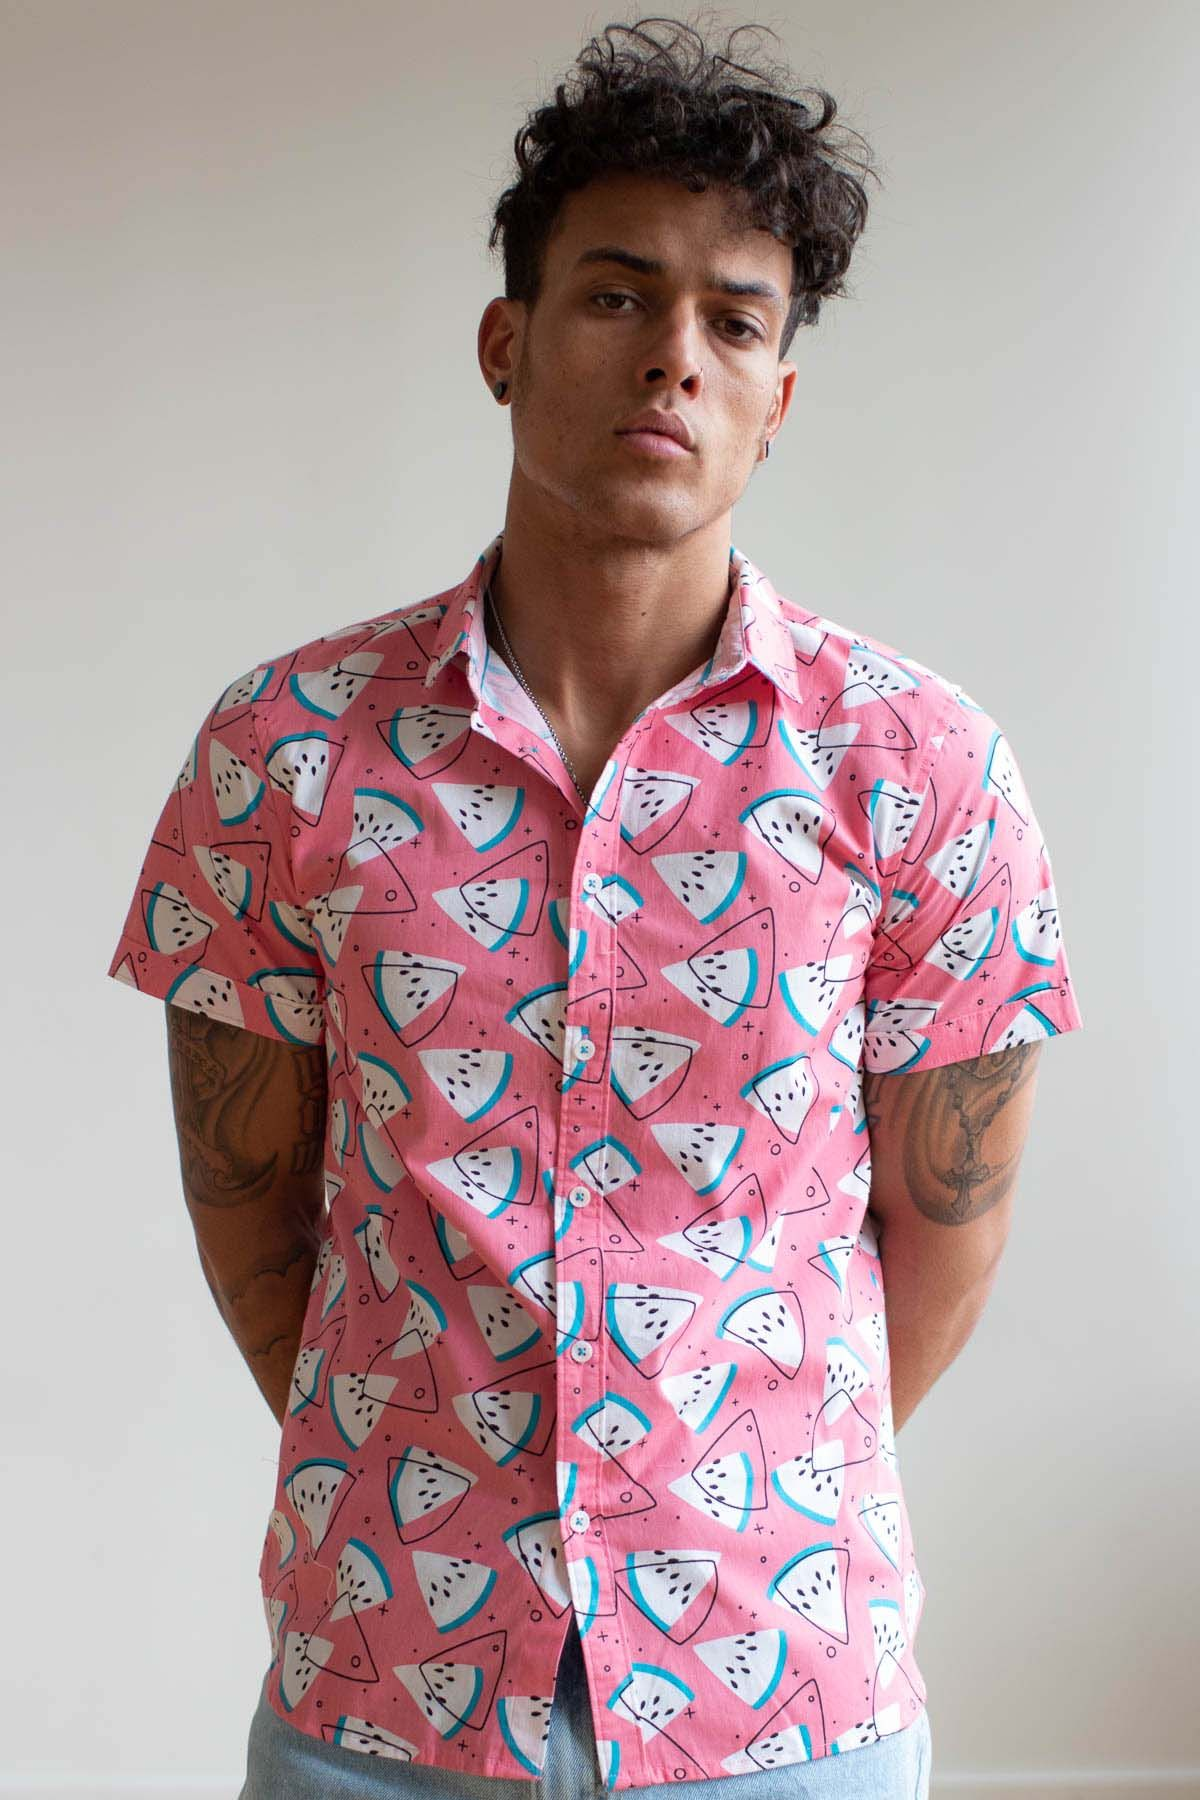 Retro Pop Watermelon Woven Button Up Shirt #retropop